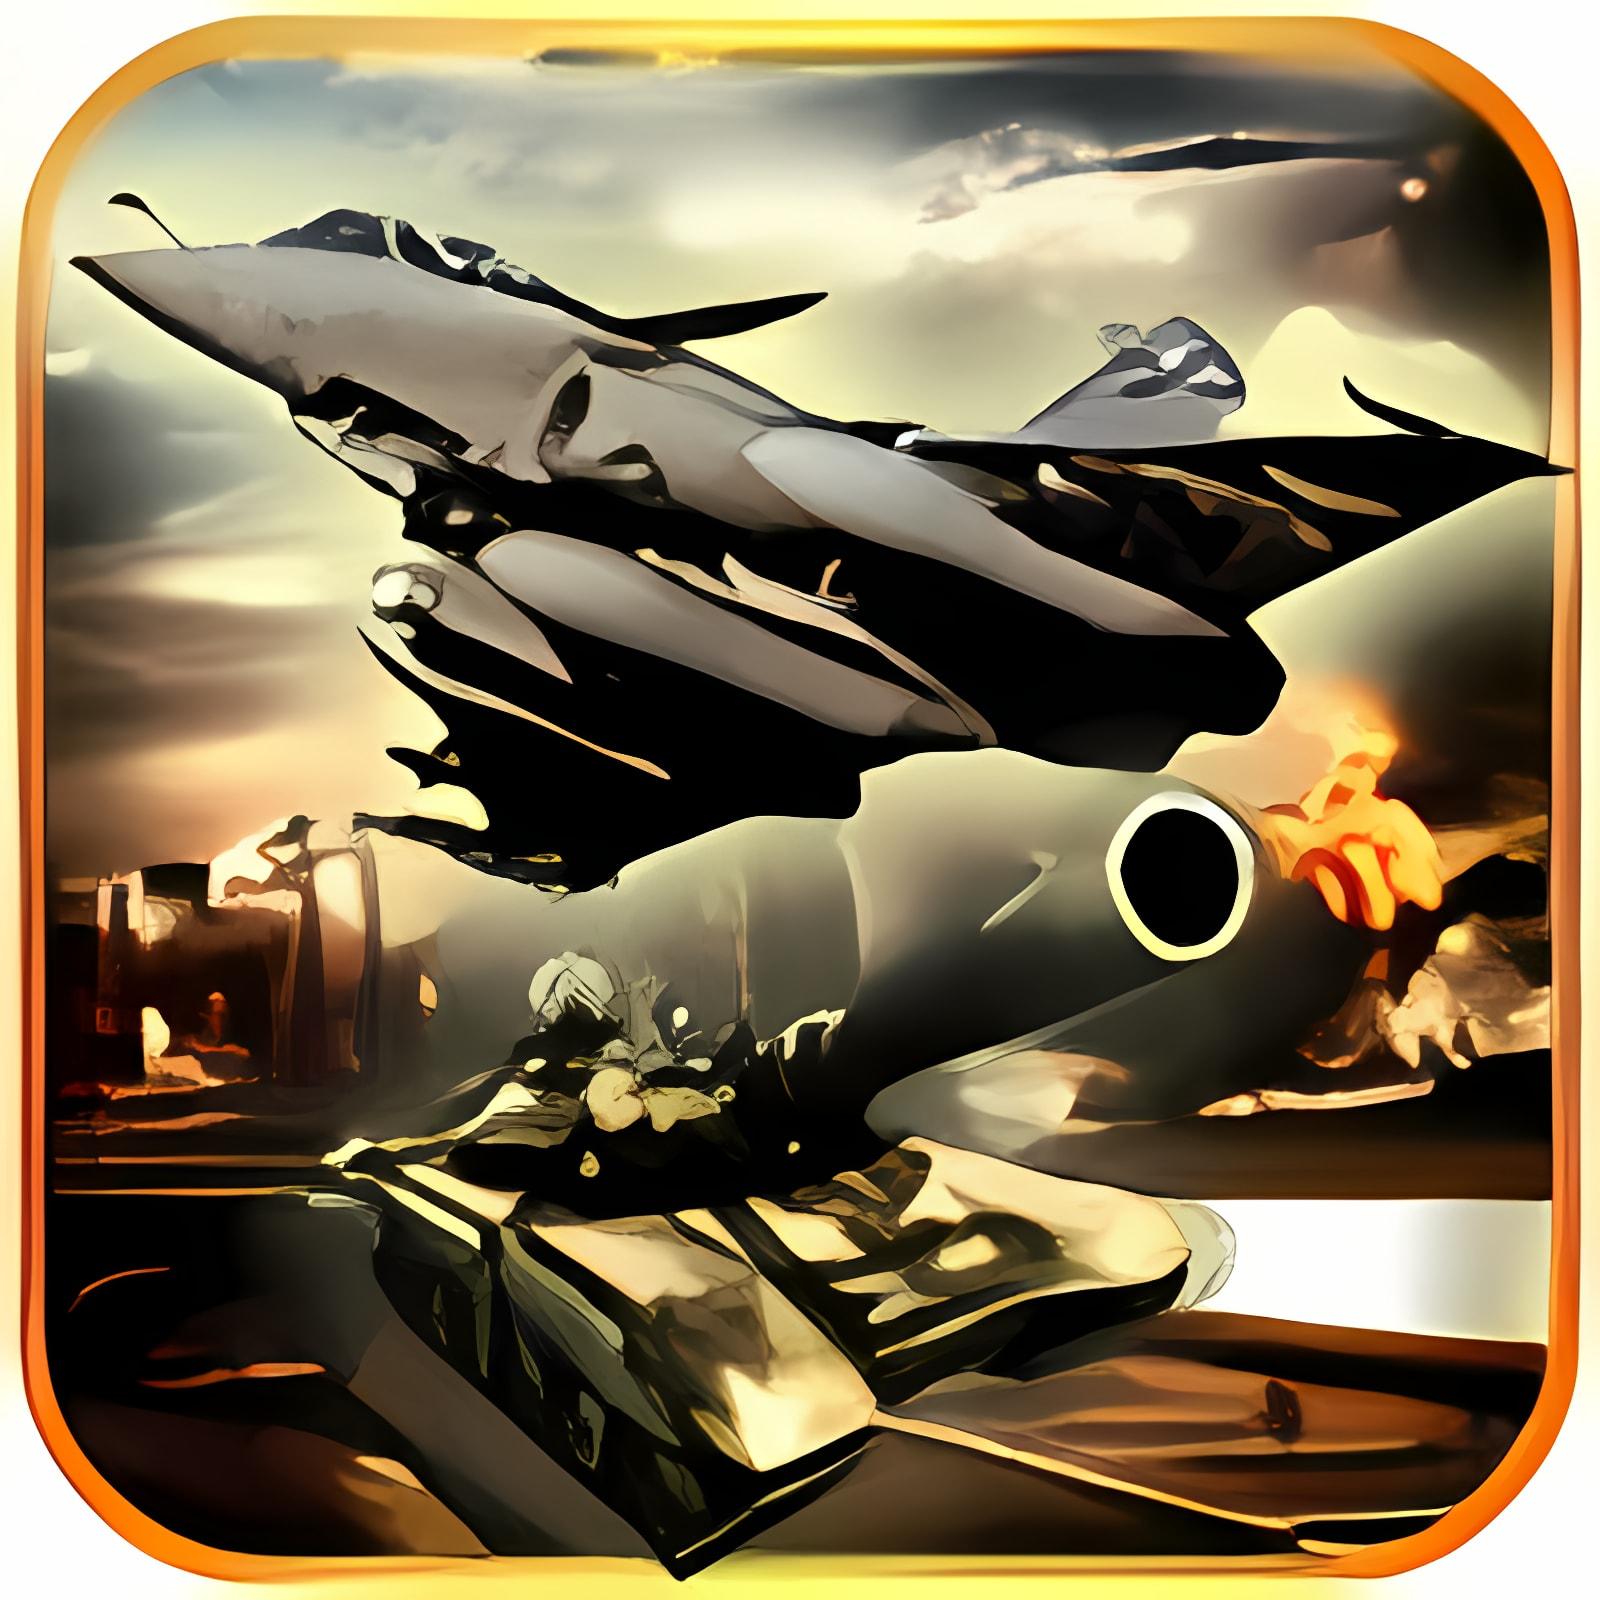 Air Force Combat Raider Attack 1.0